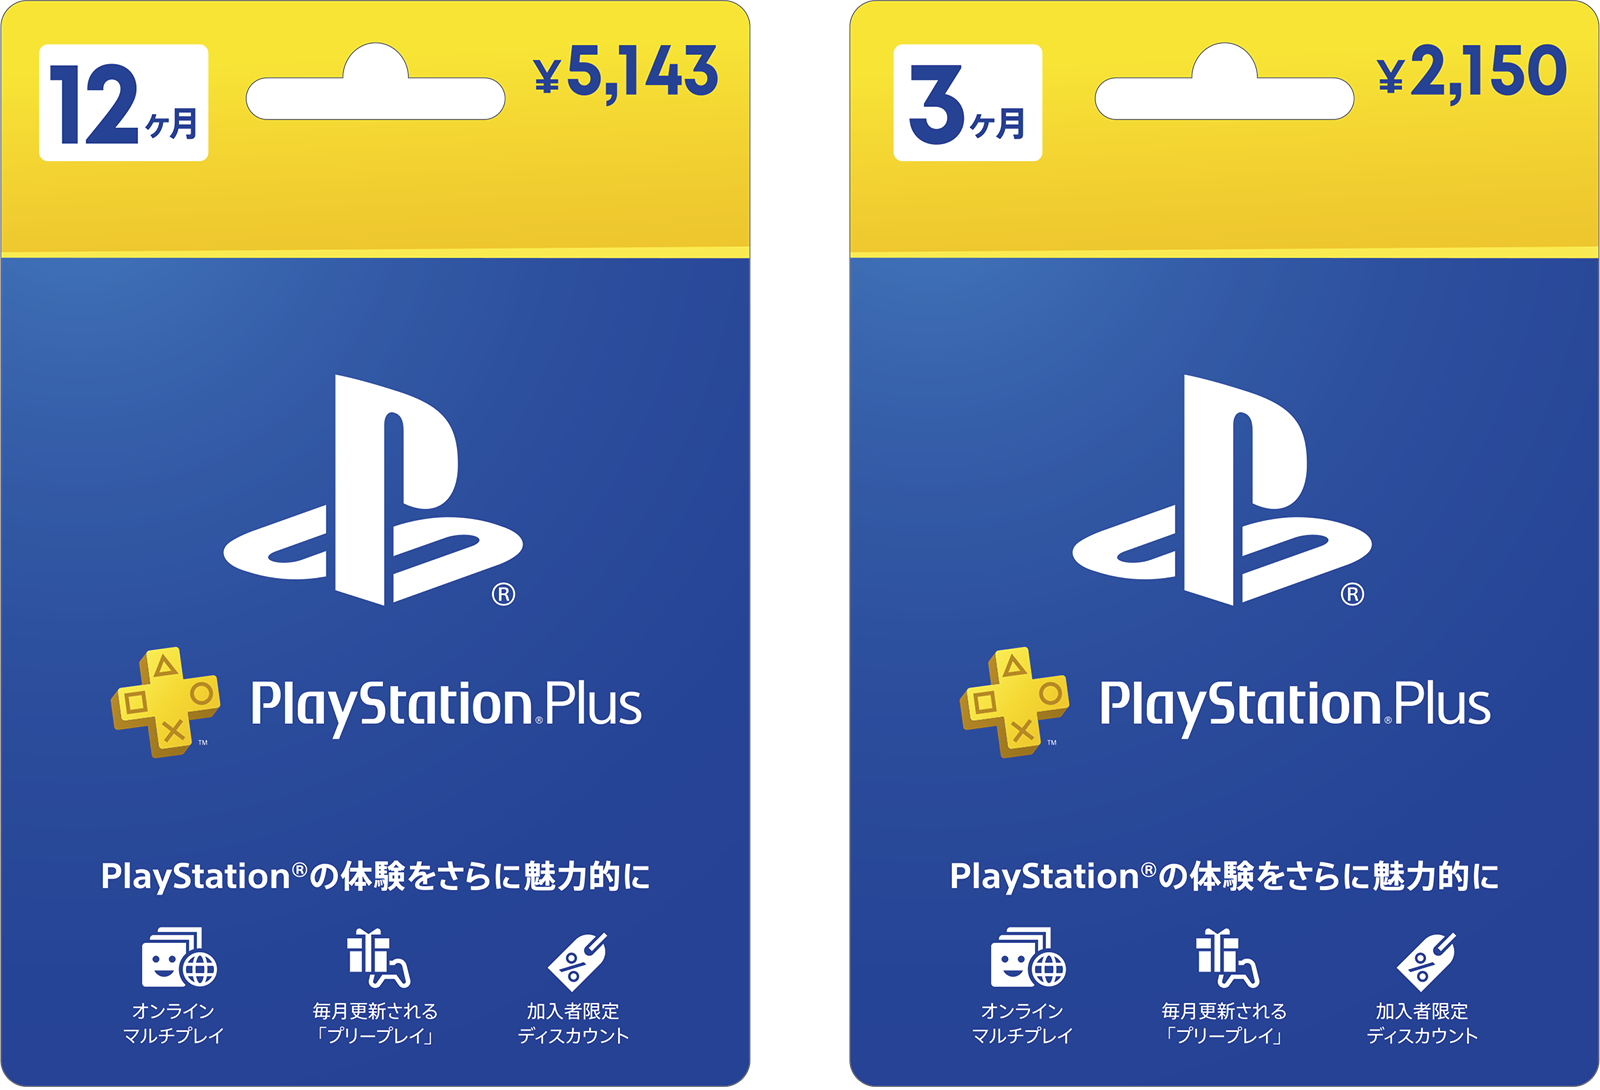 PlayStation Plus利用権カード(3ヶ月,12ヶ月)